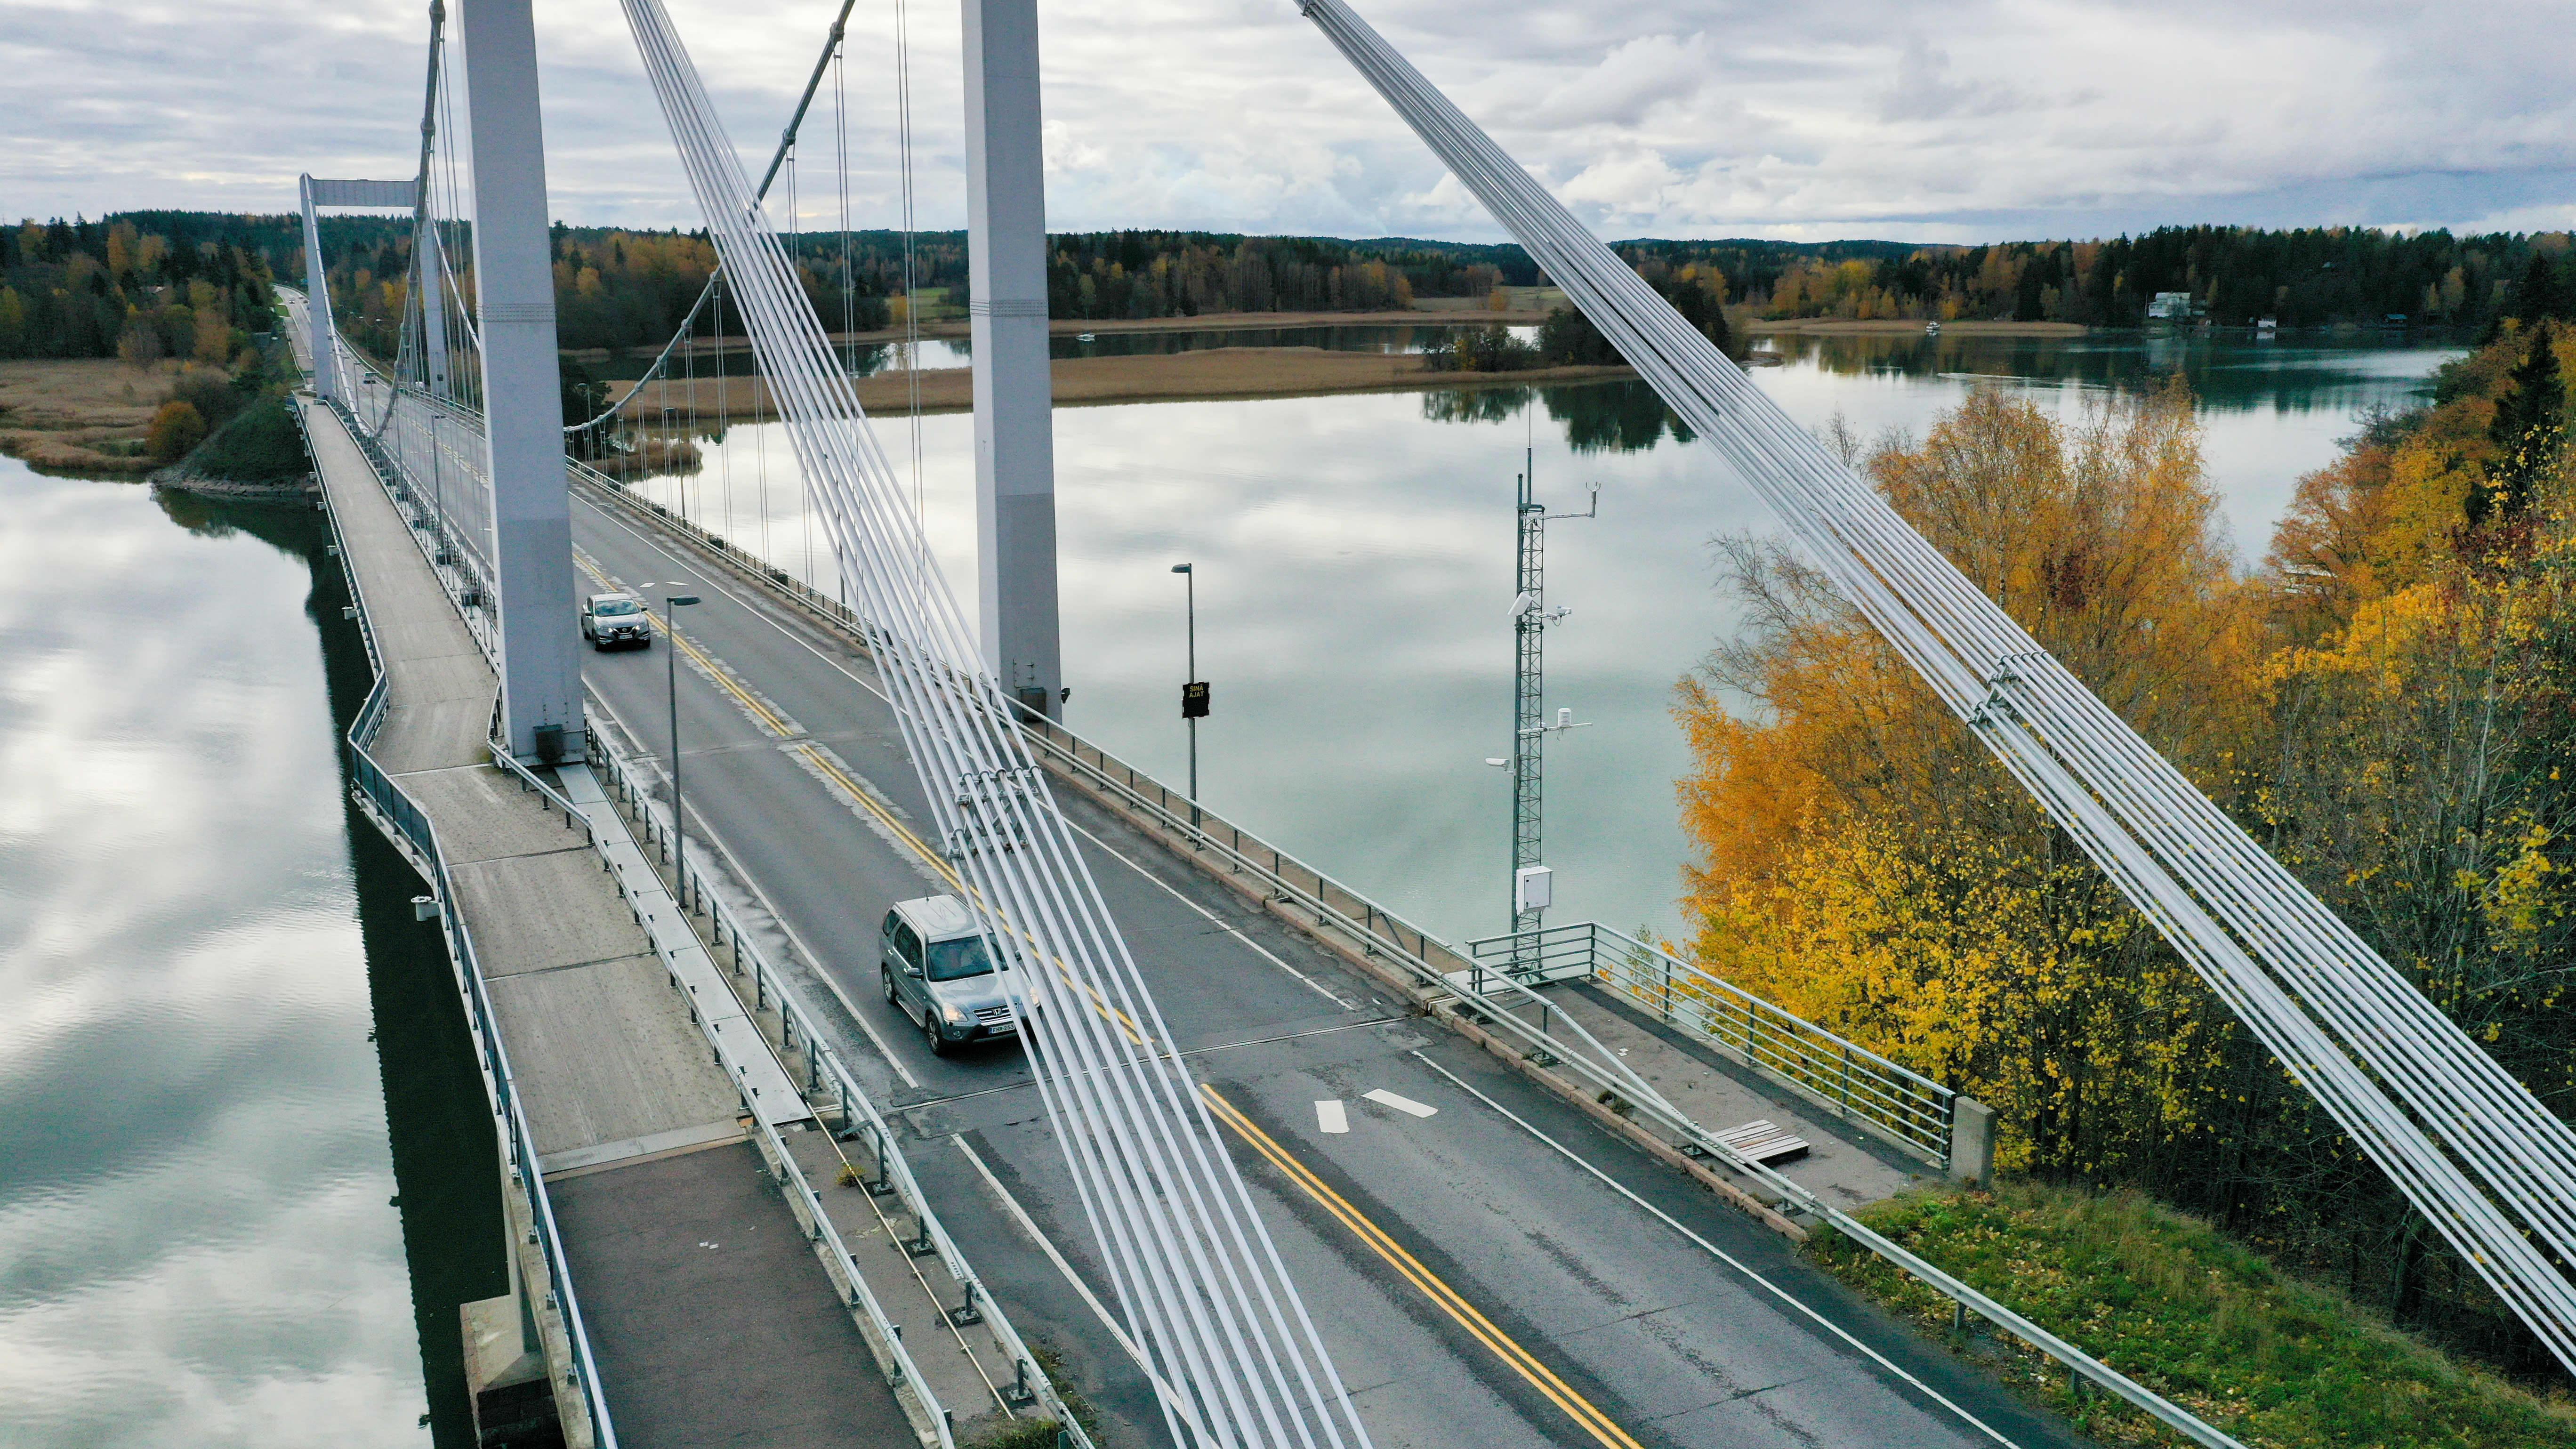 Kirjalansalmen silta